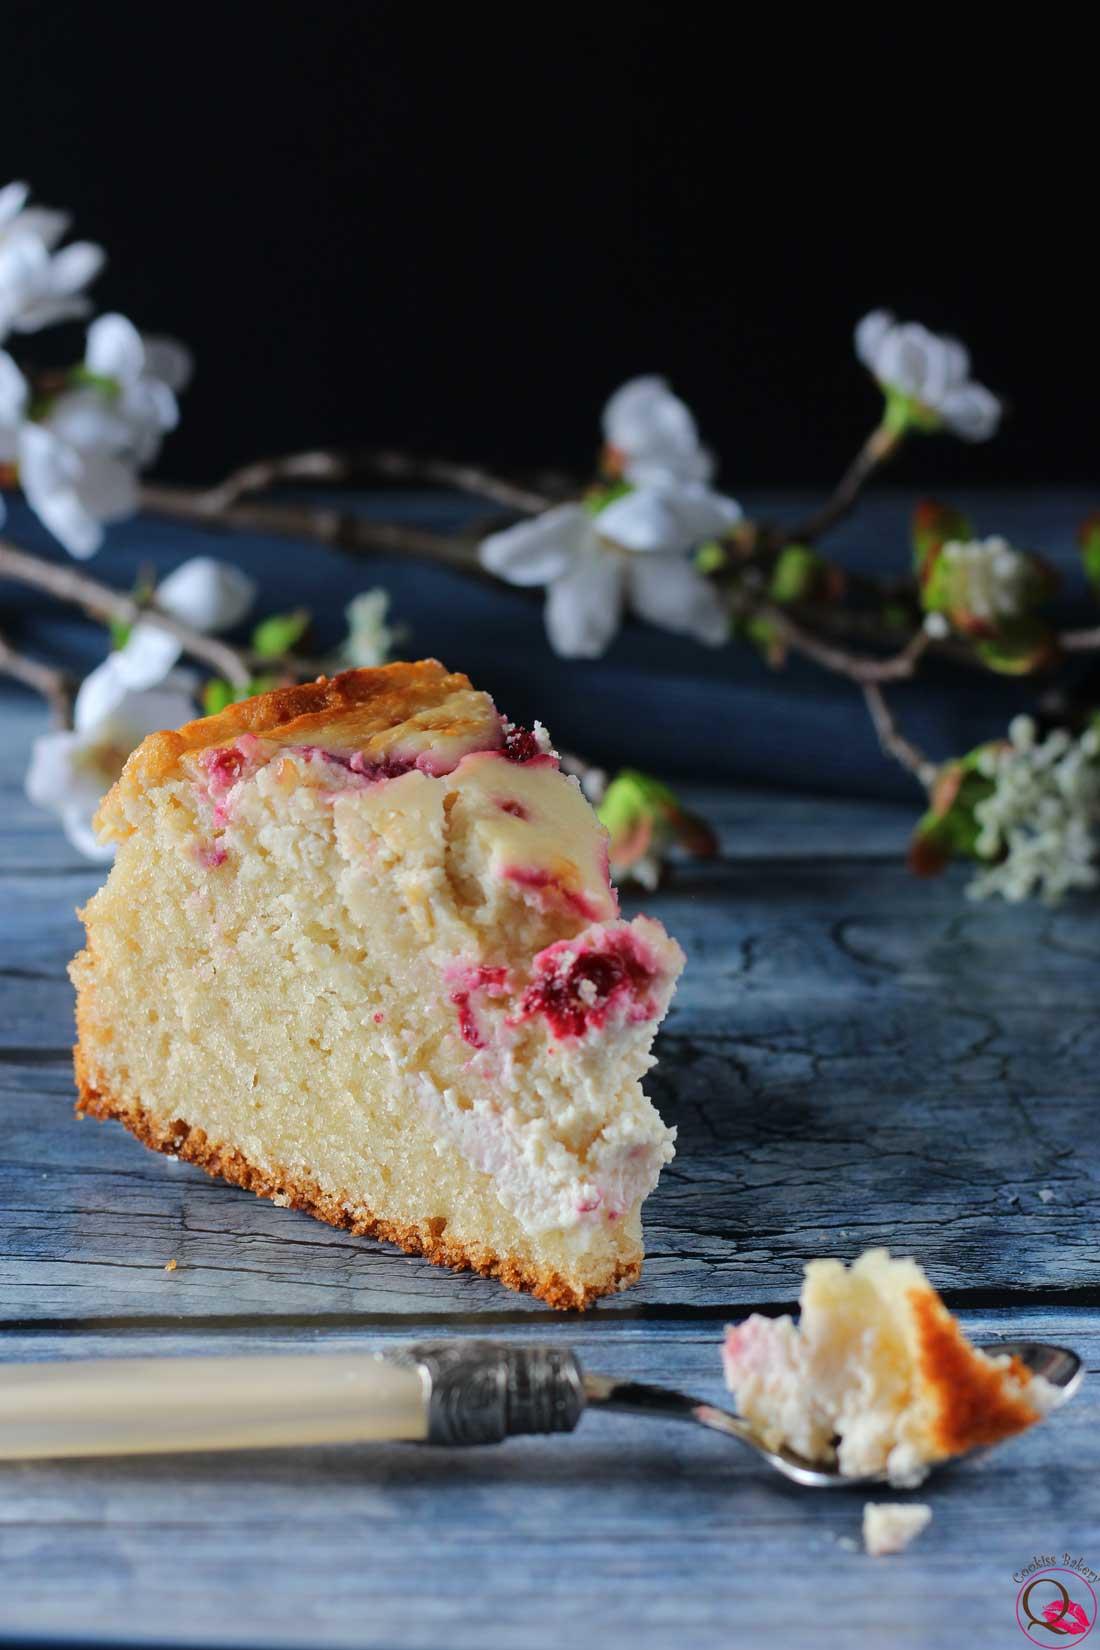 torta 2 in 1 cheesecake e torta allo yogurt fetta mangiata